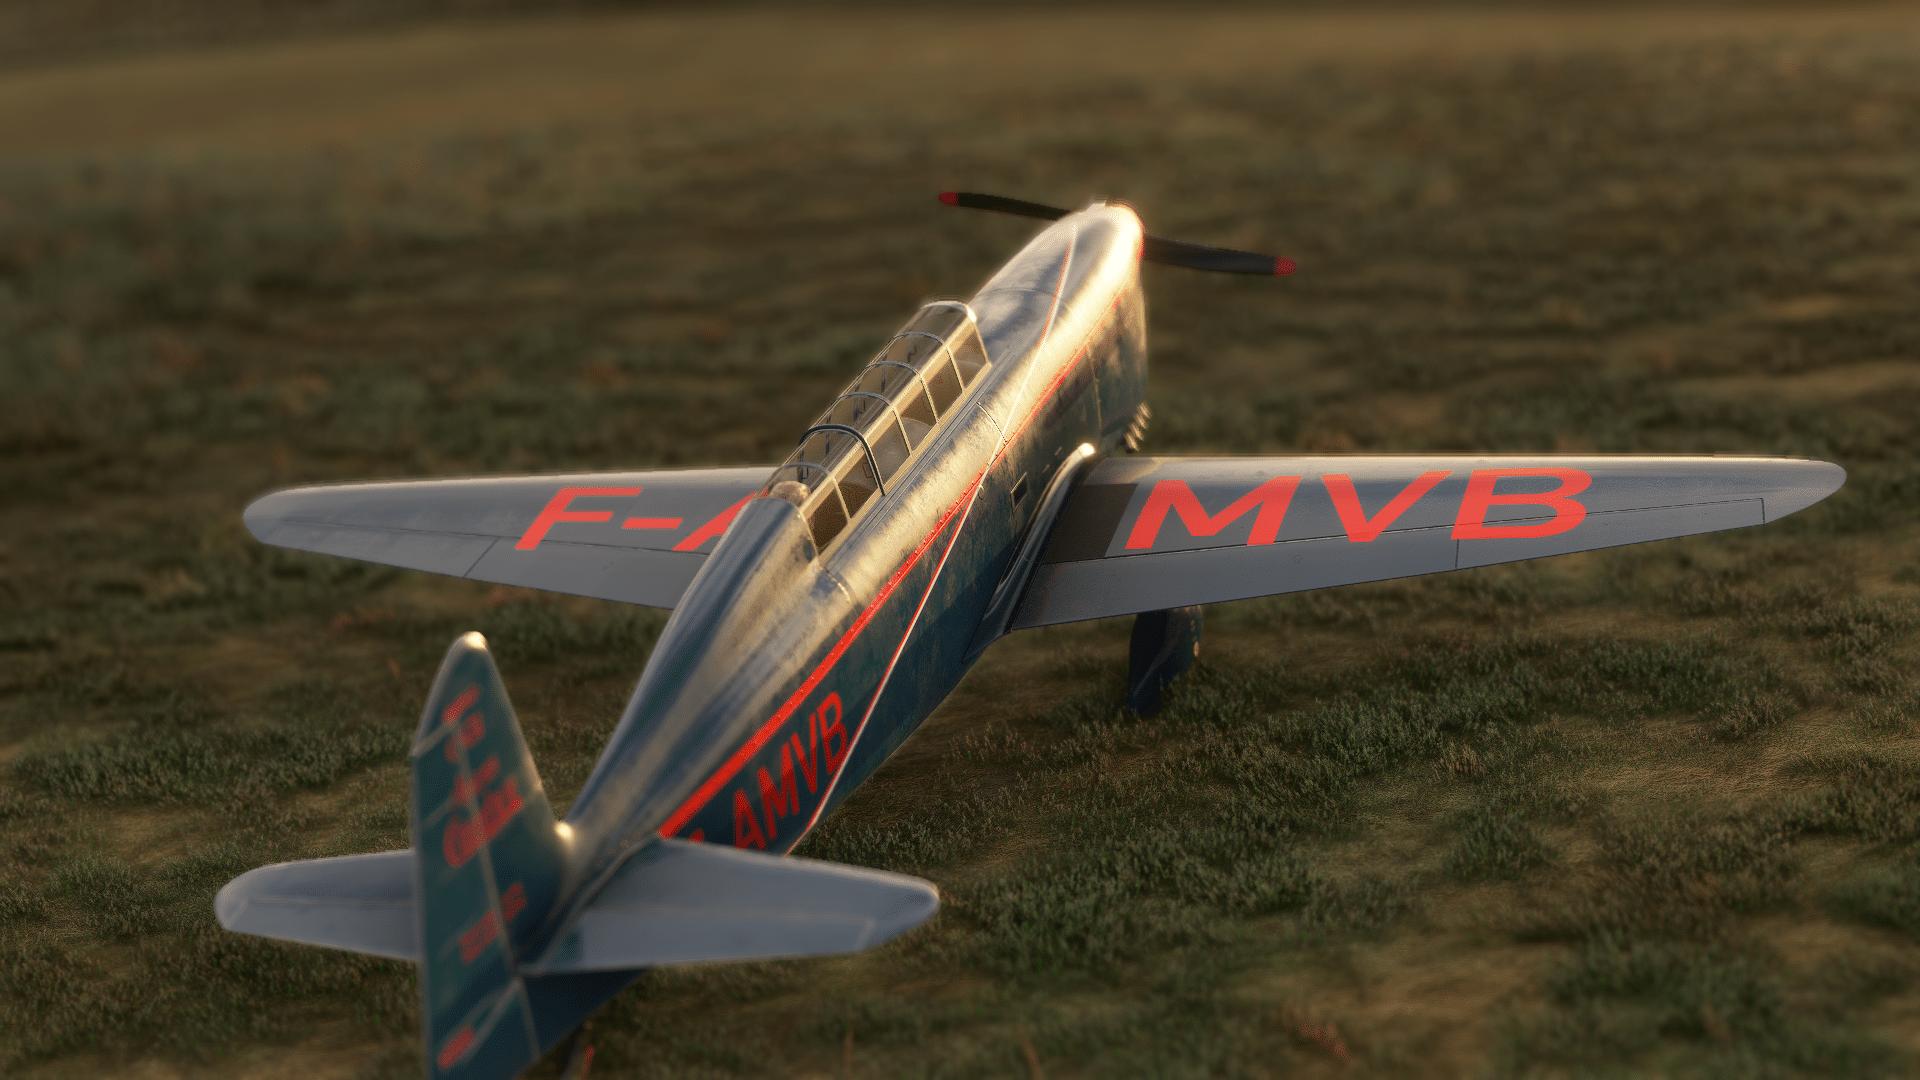 266272_Microsoft_Flight_Simulator_Screenshot_2021.05.28_-_11.17.59.42